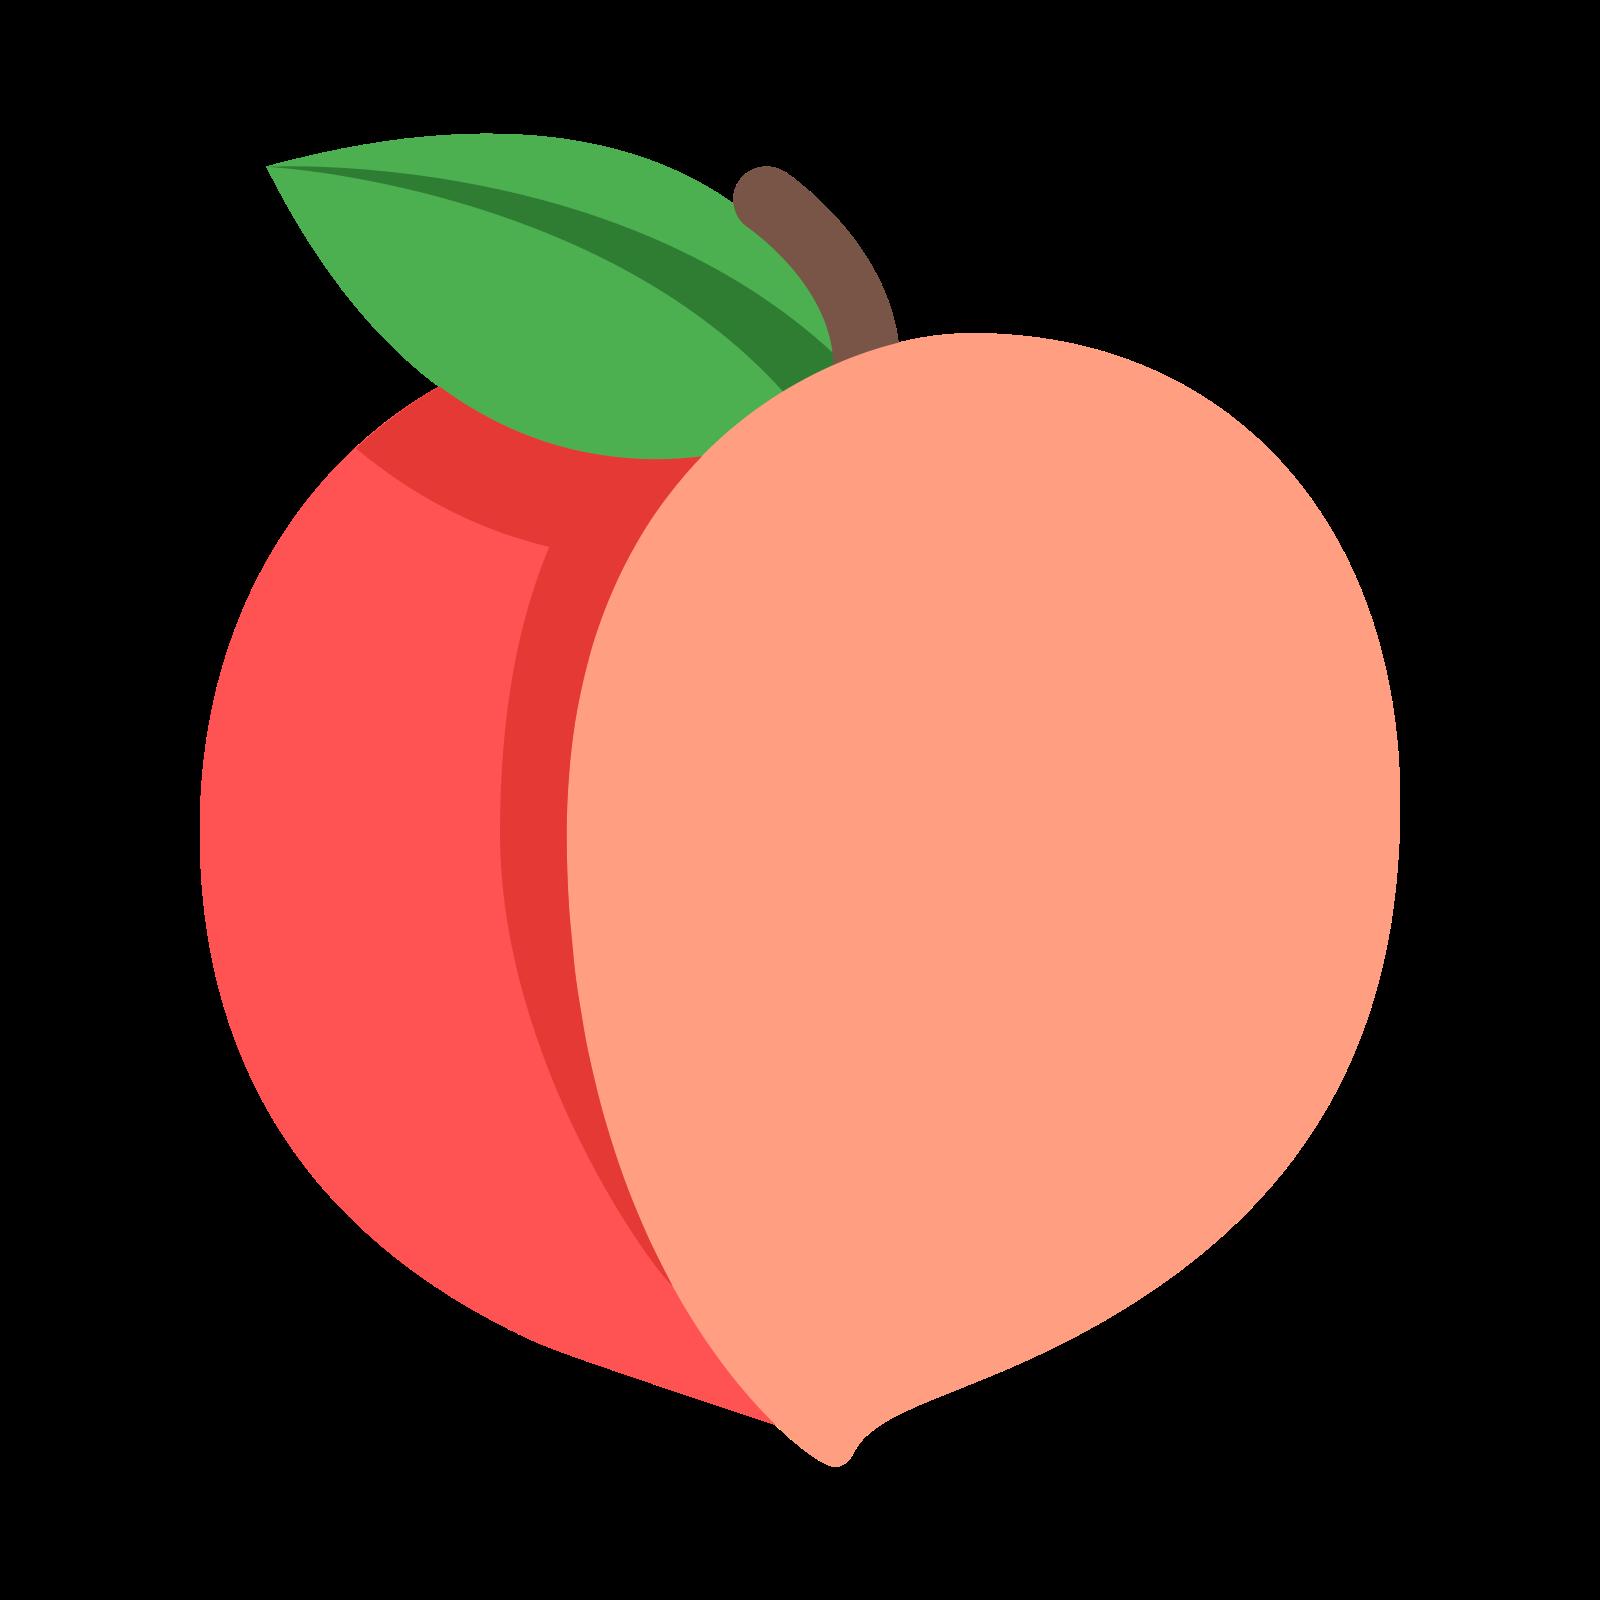 peach clipart transparent